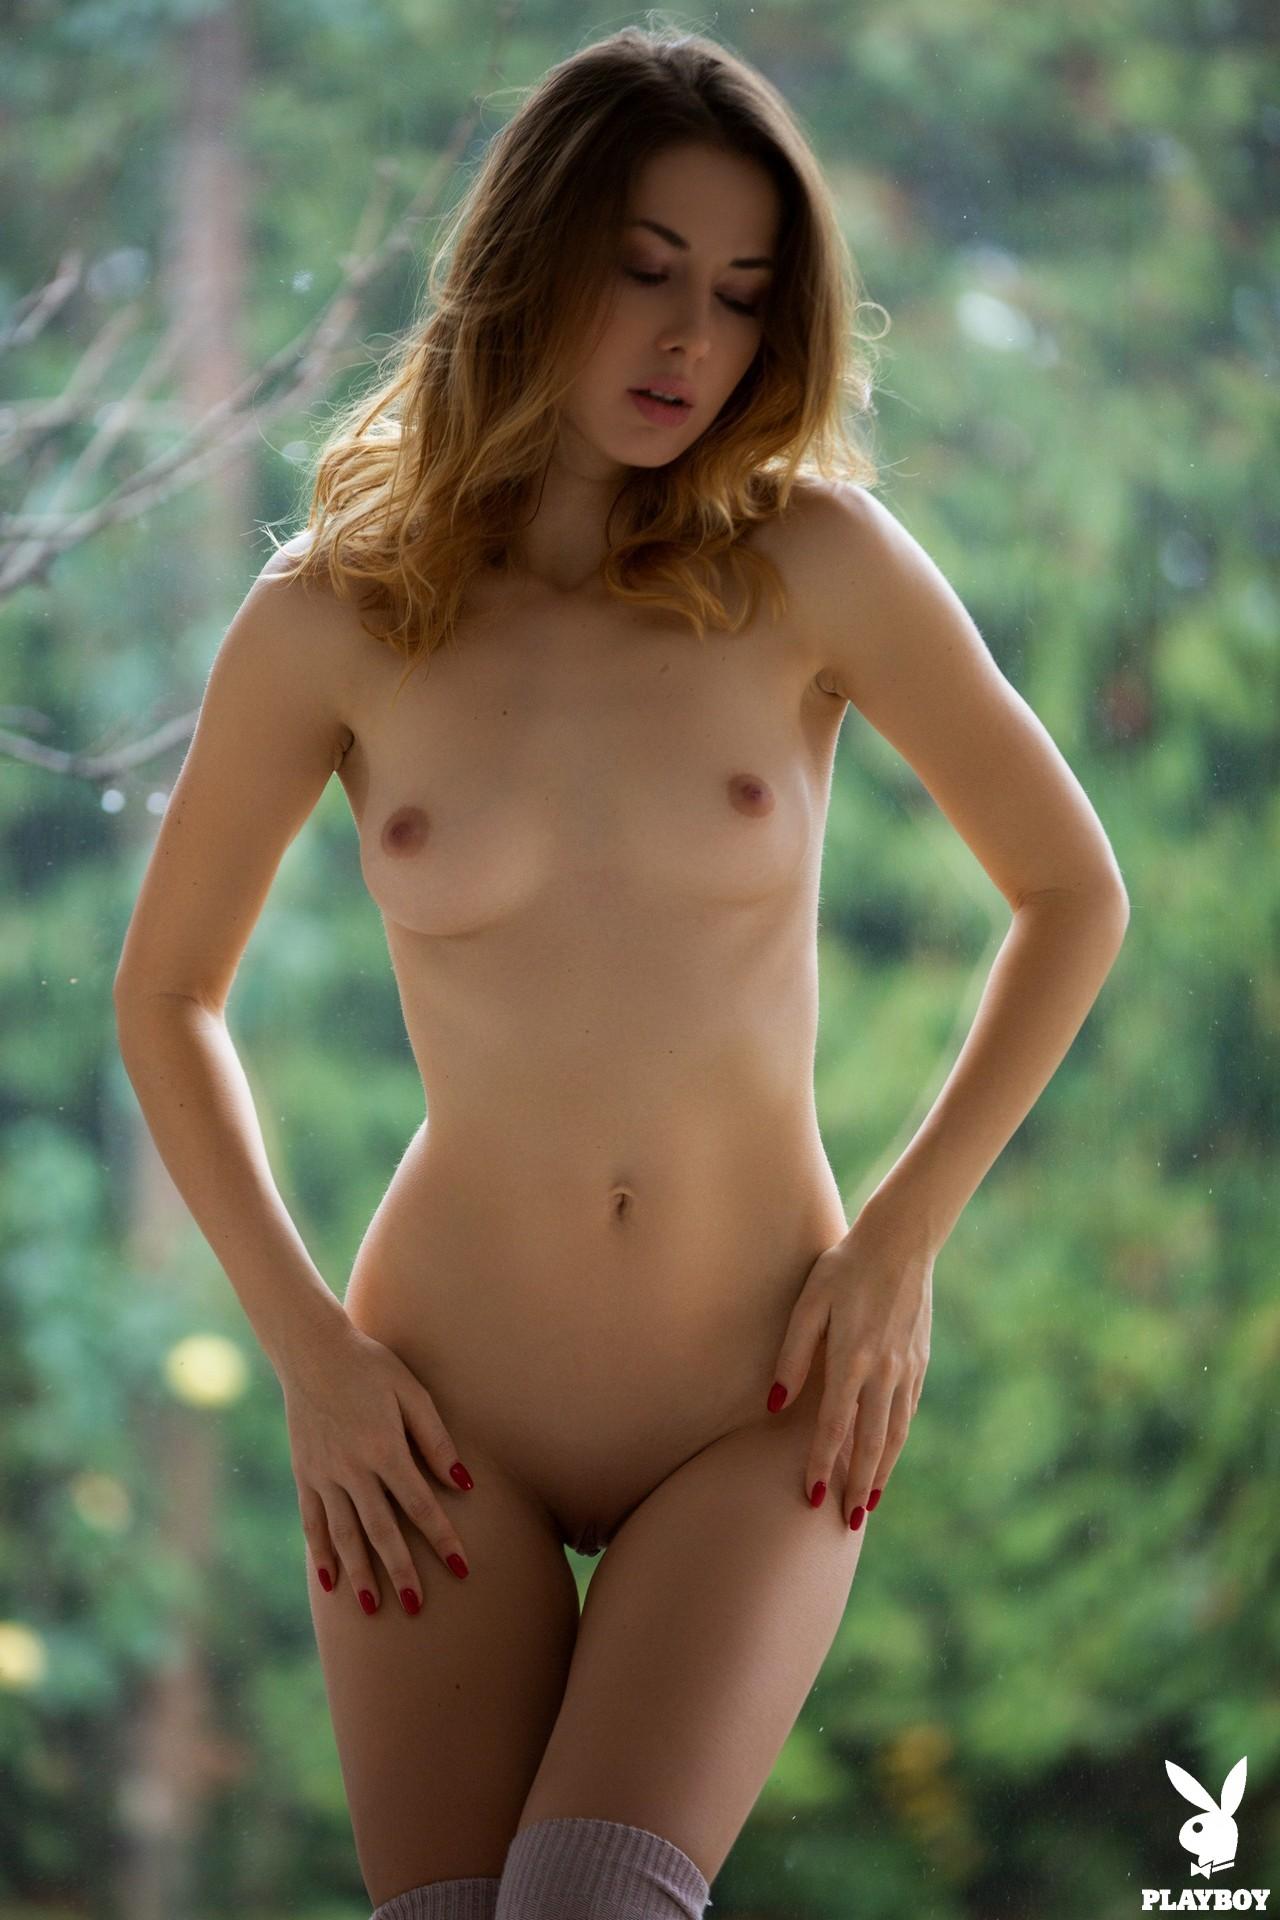 Diana Lark In Pure Innocence Playboy Plus (24)